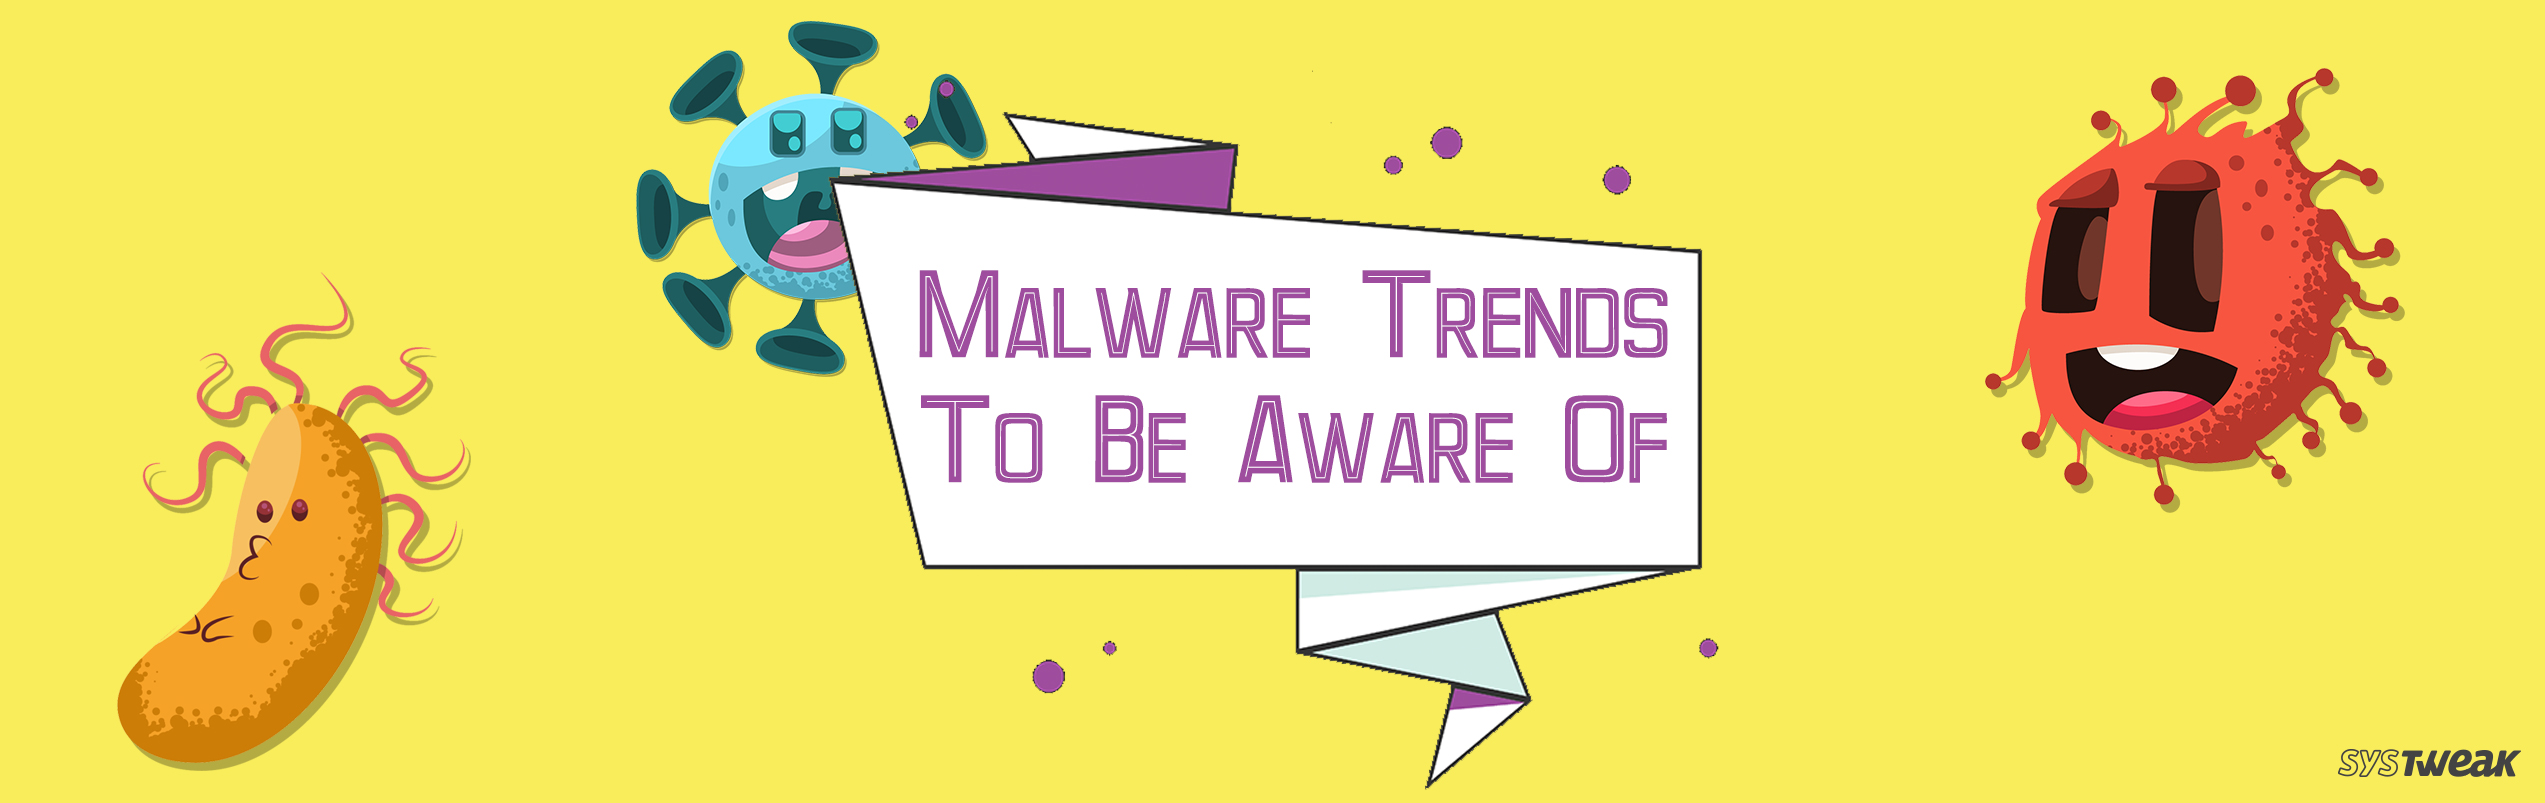 Top 3 Recent Mac Malware Threatening Security